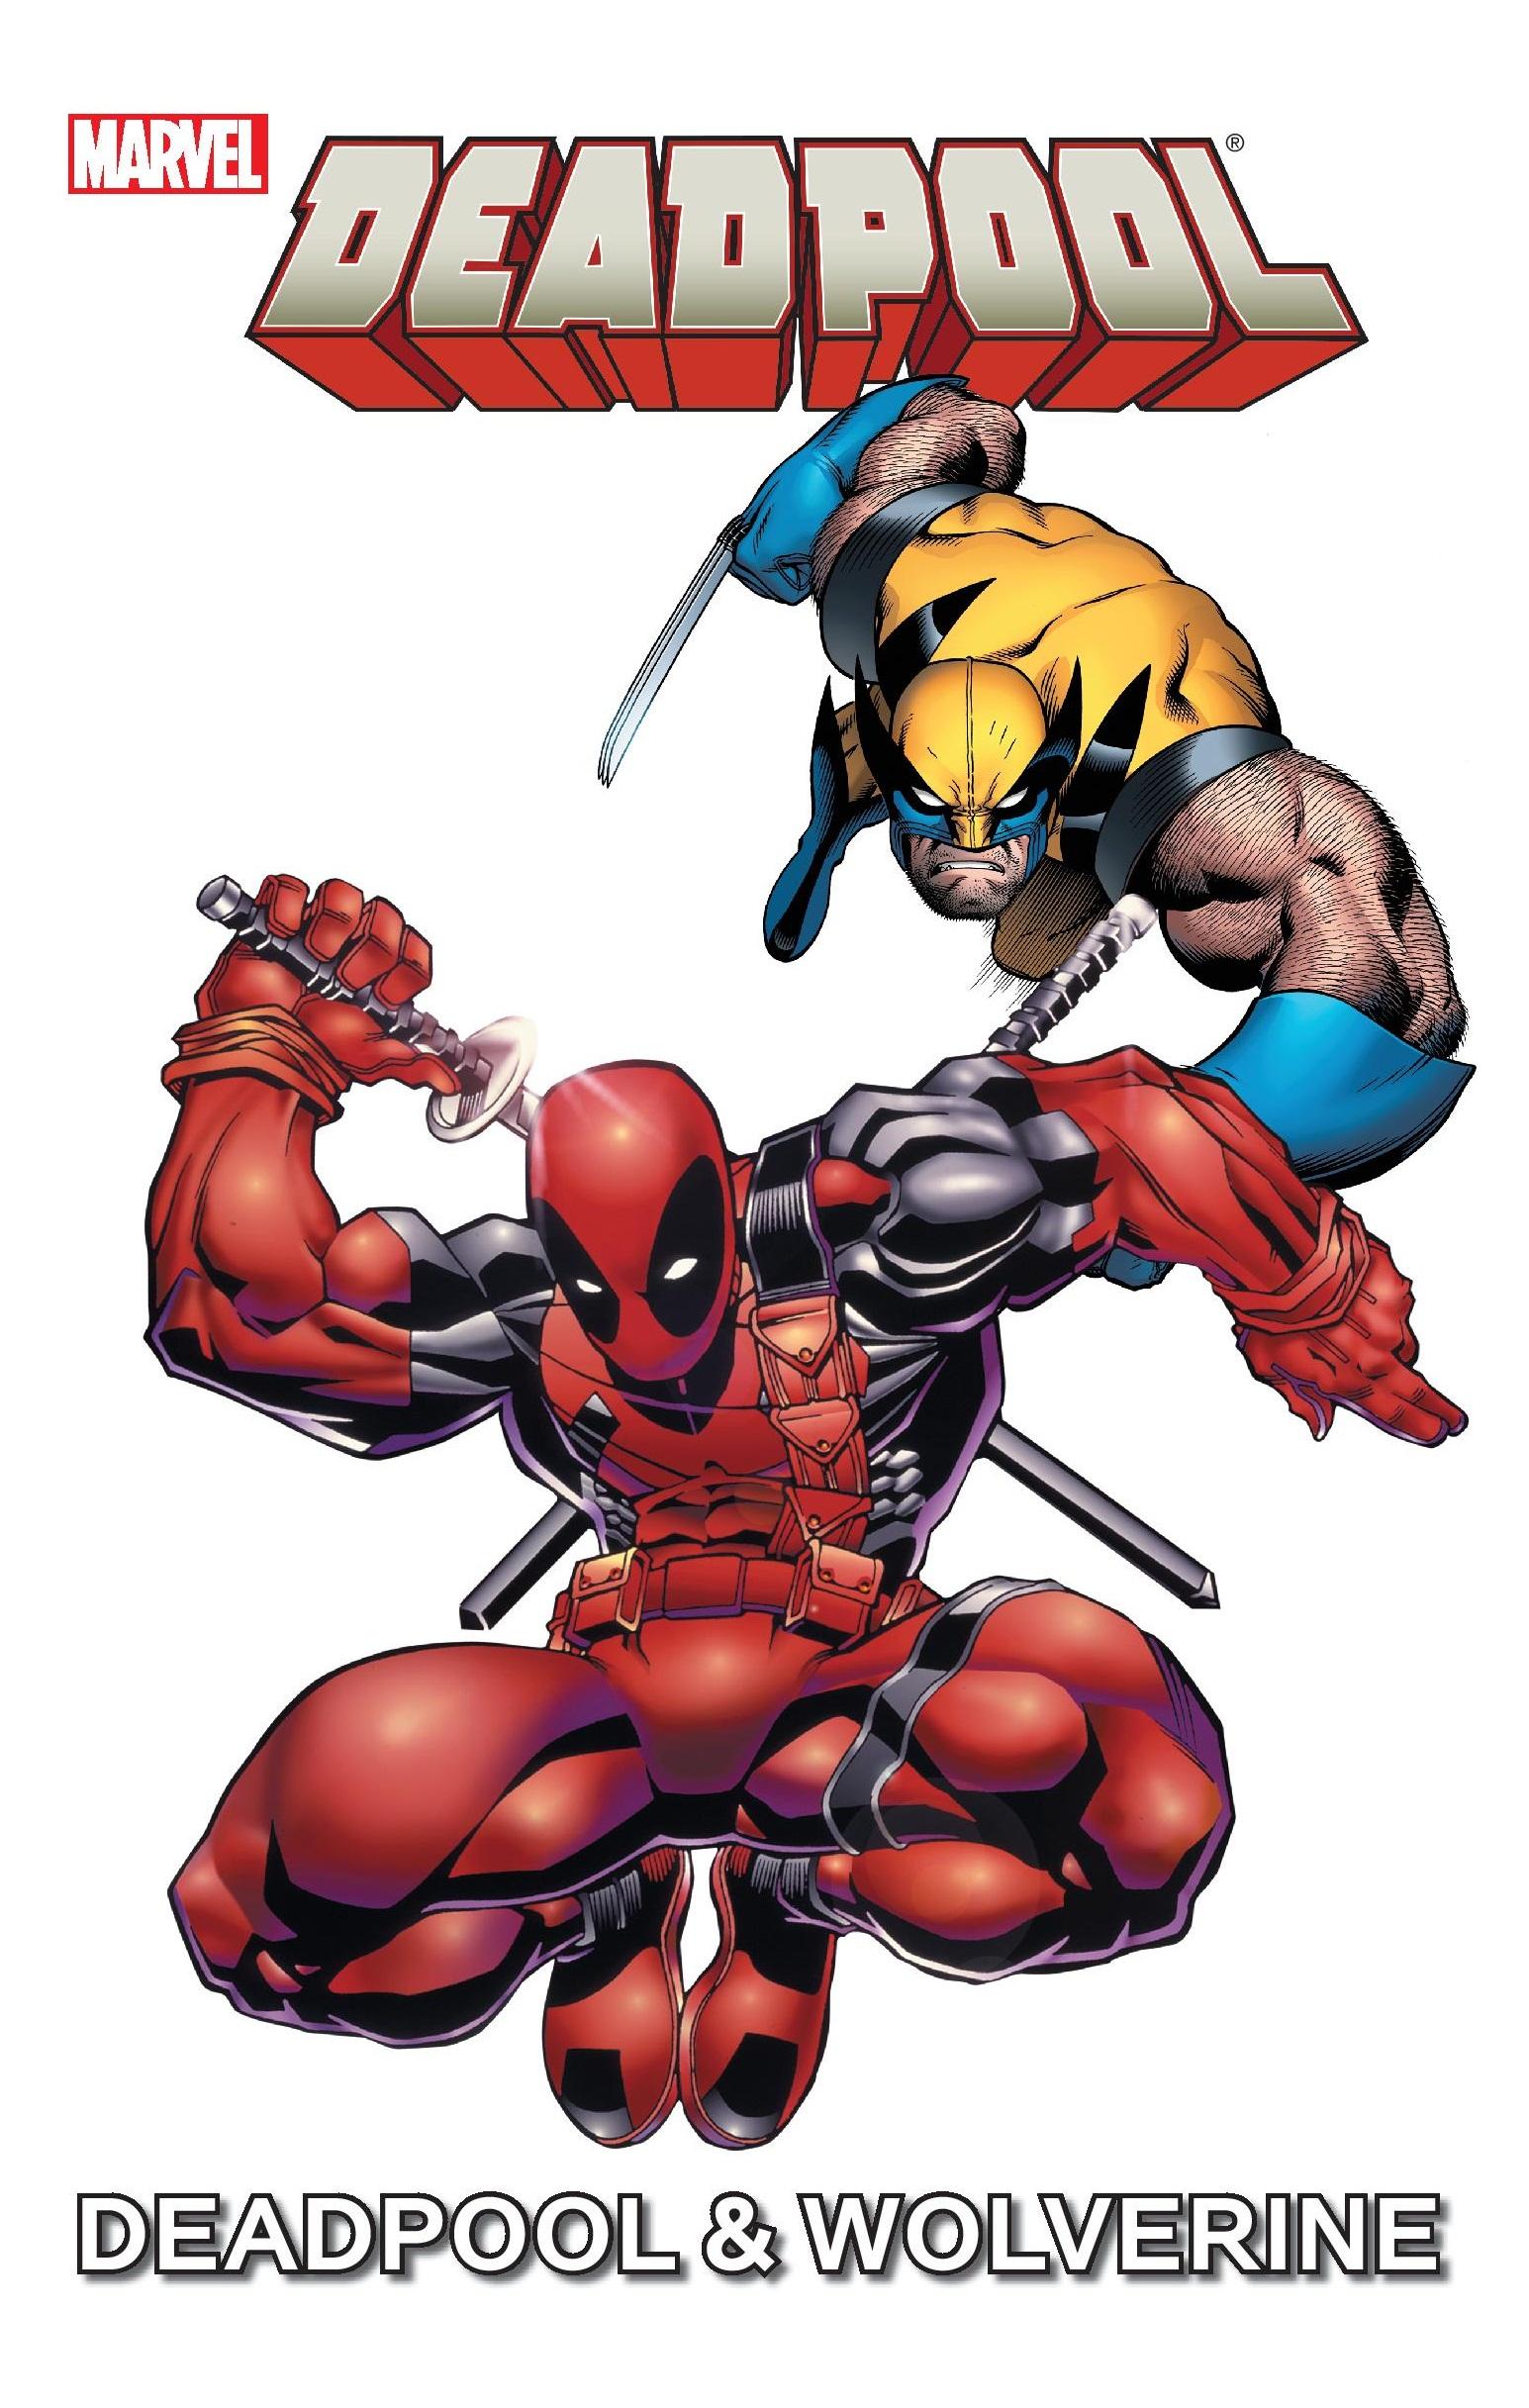 Marvel Universe Deadpool & Wolverine (Digest)